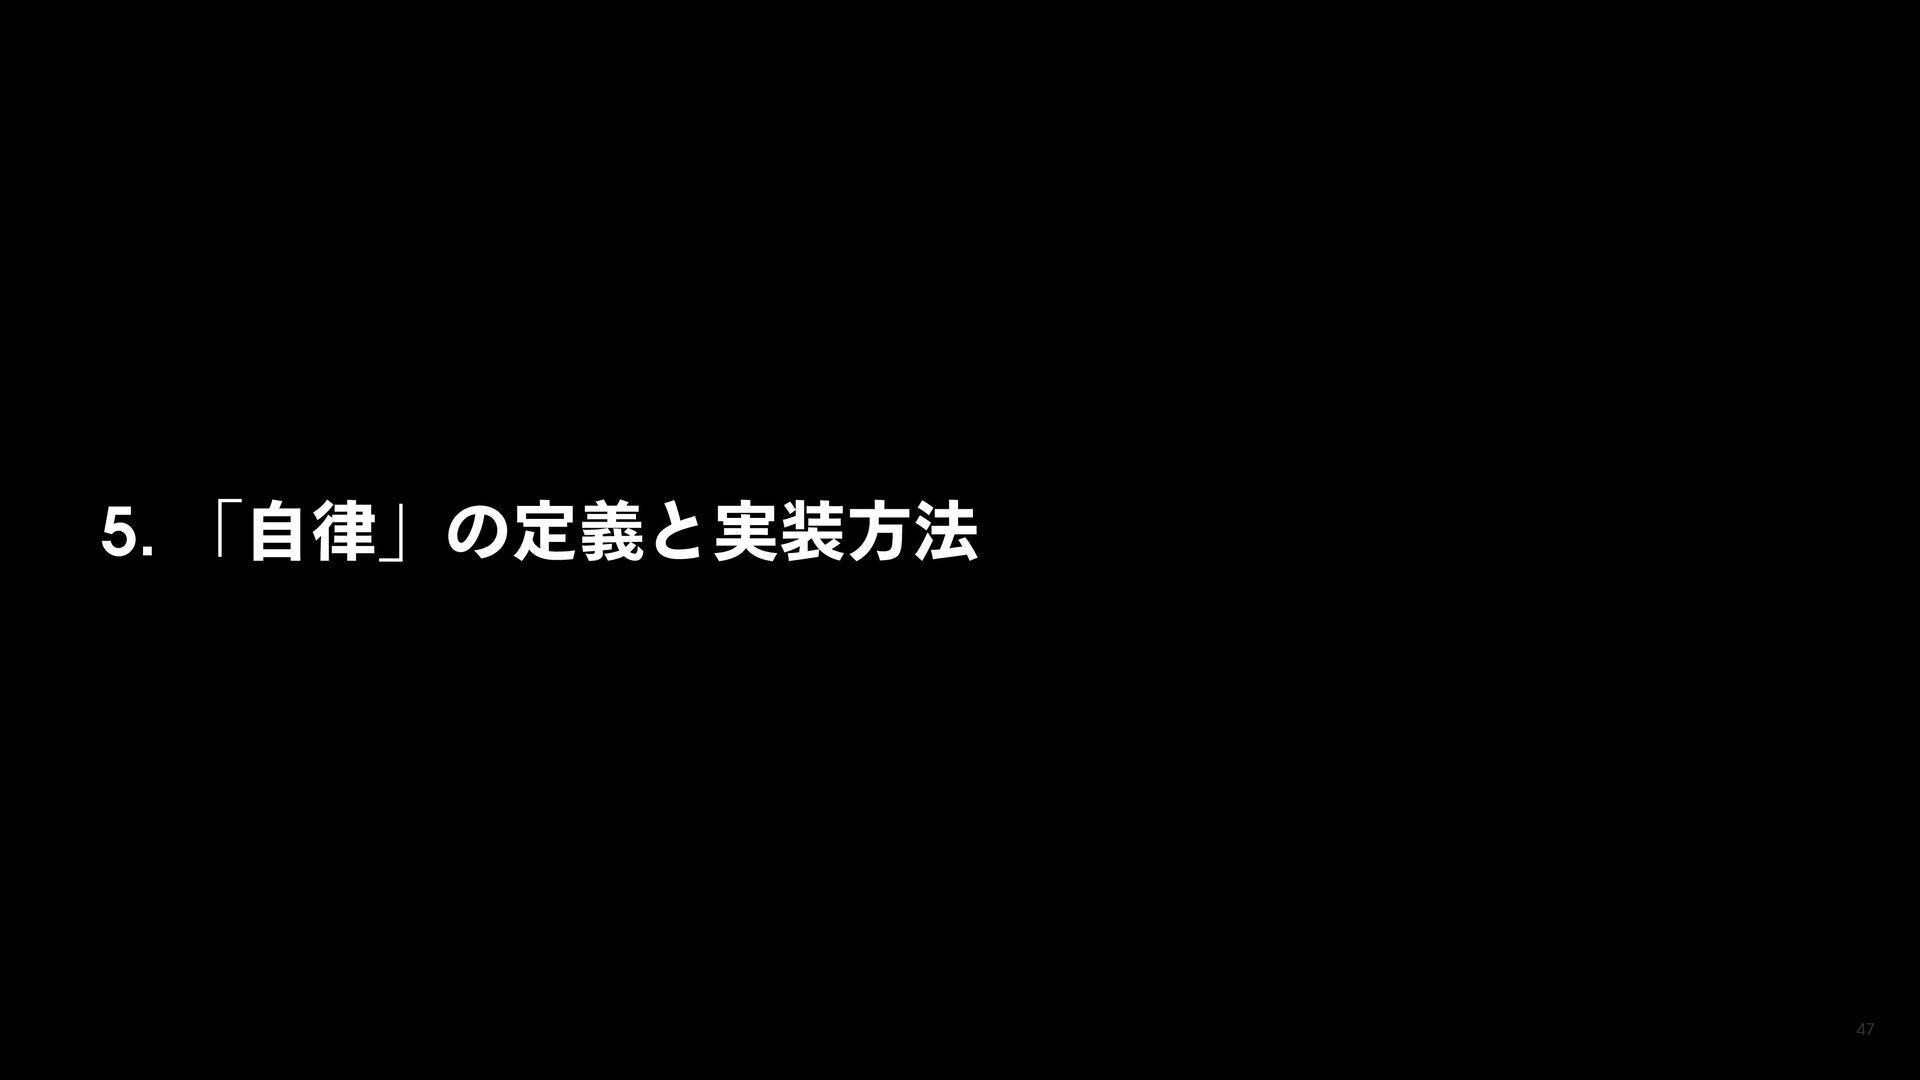 5. ʮࣗʯͷఆٛͱ࣮ํ๏